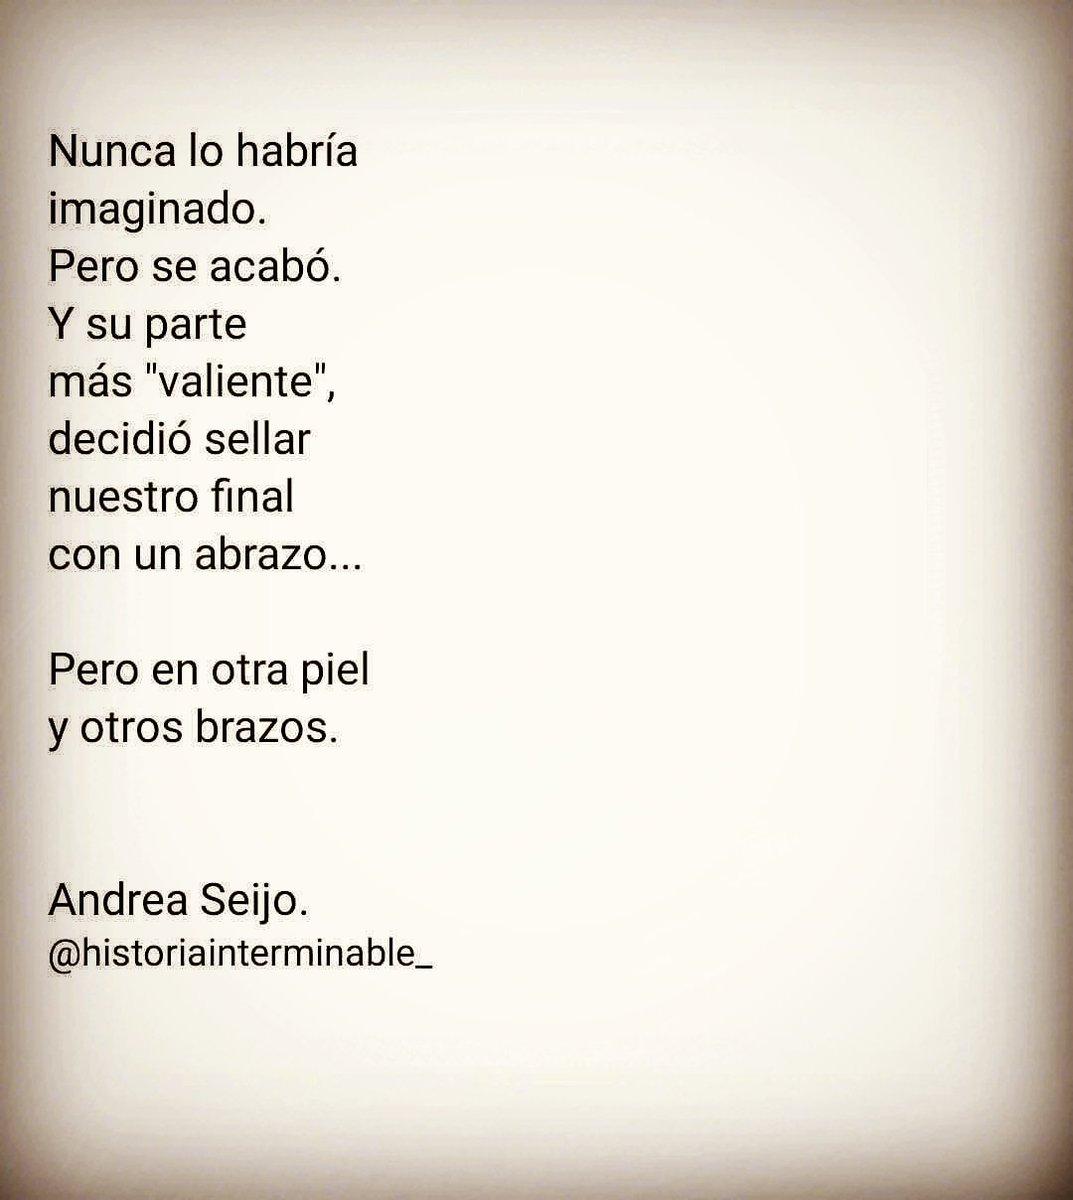 Andrea Seijo On Twitter Poesía Poemas Textos